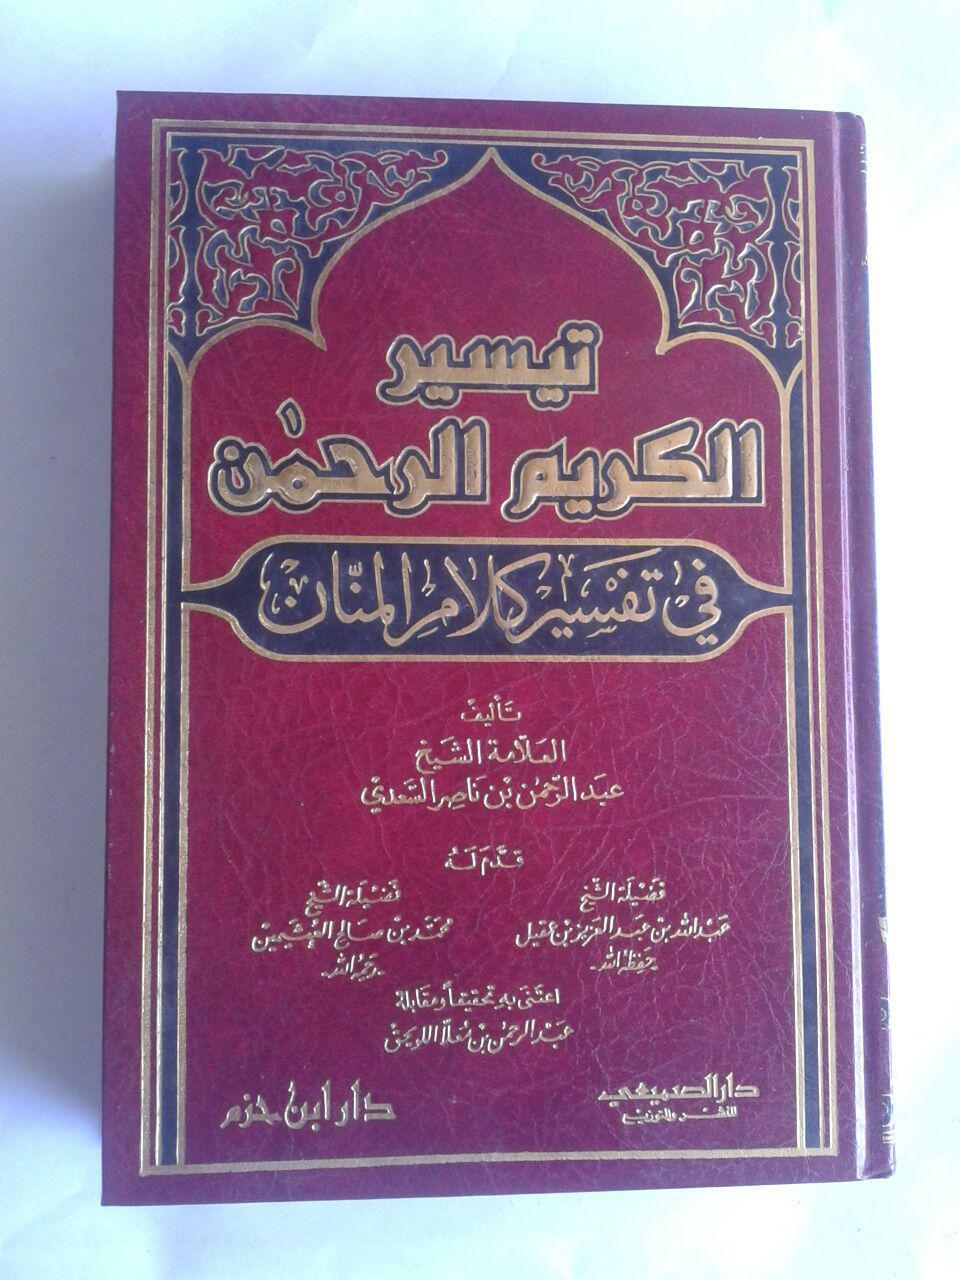 Kitab Taisir Karimir Rahman As-Sa'di cover